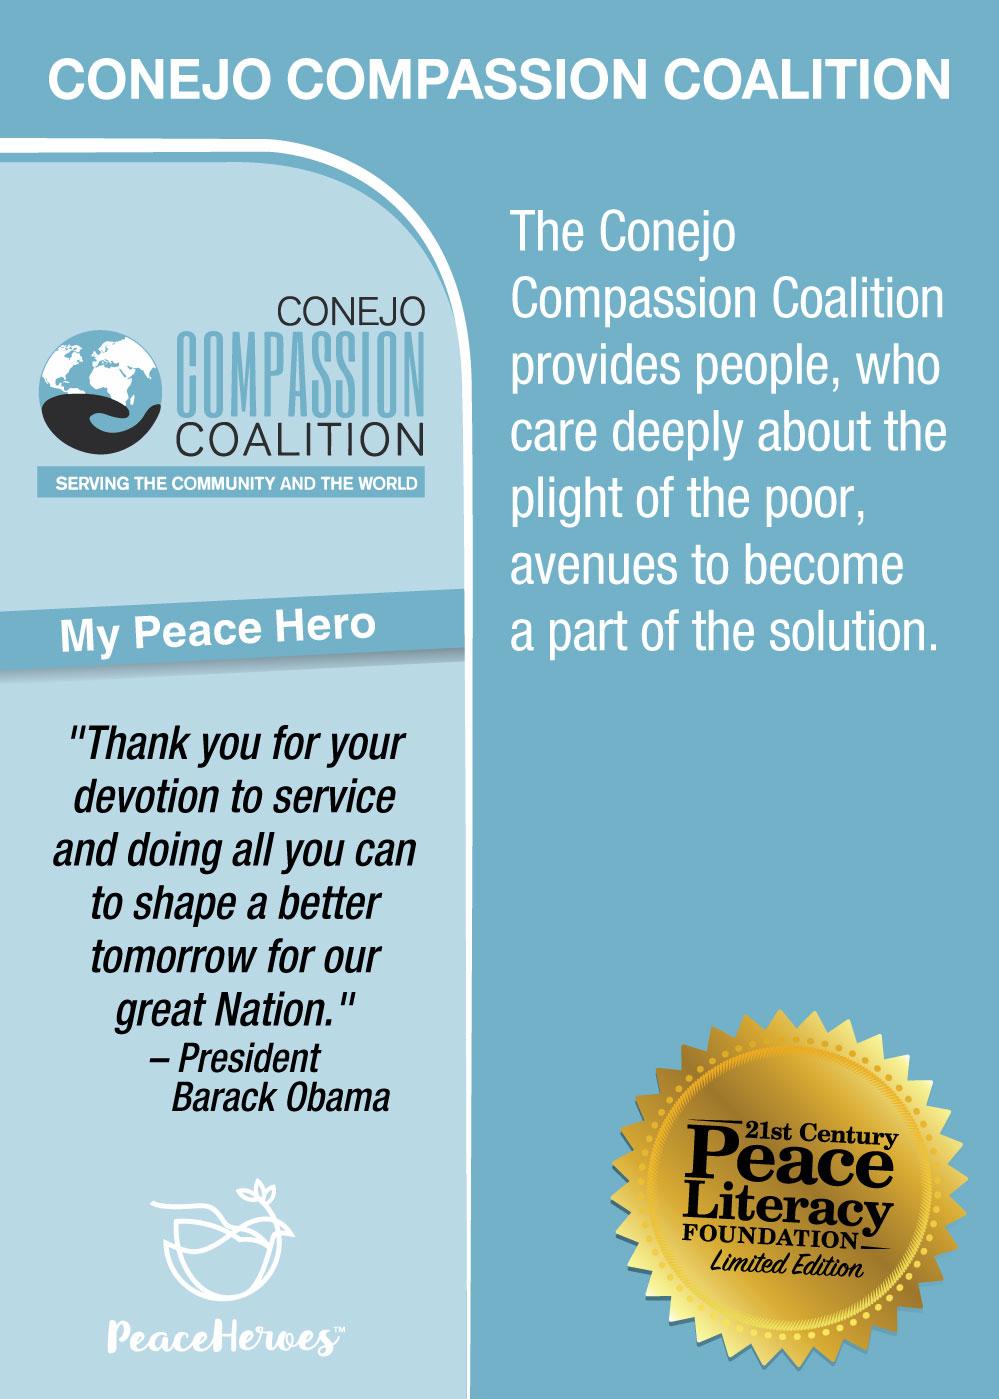 ConejoCompassionCoalition.jpg